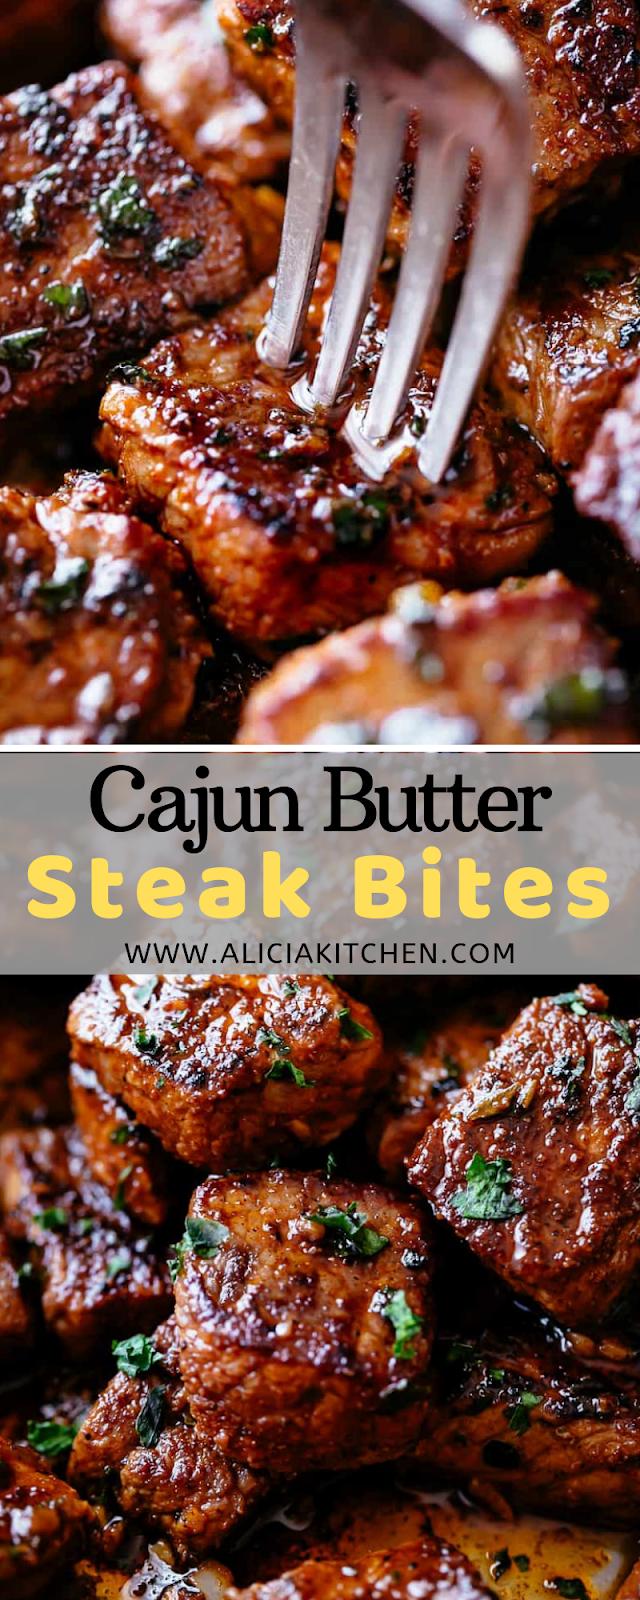 Photo of Cаjun Buttеr Steak Bіtеѕ – Cooking Recipes